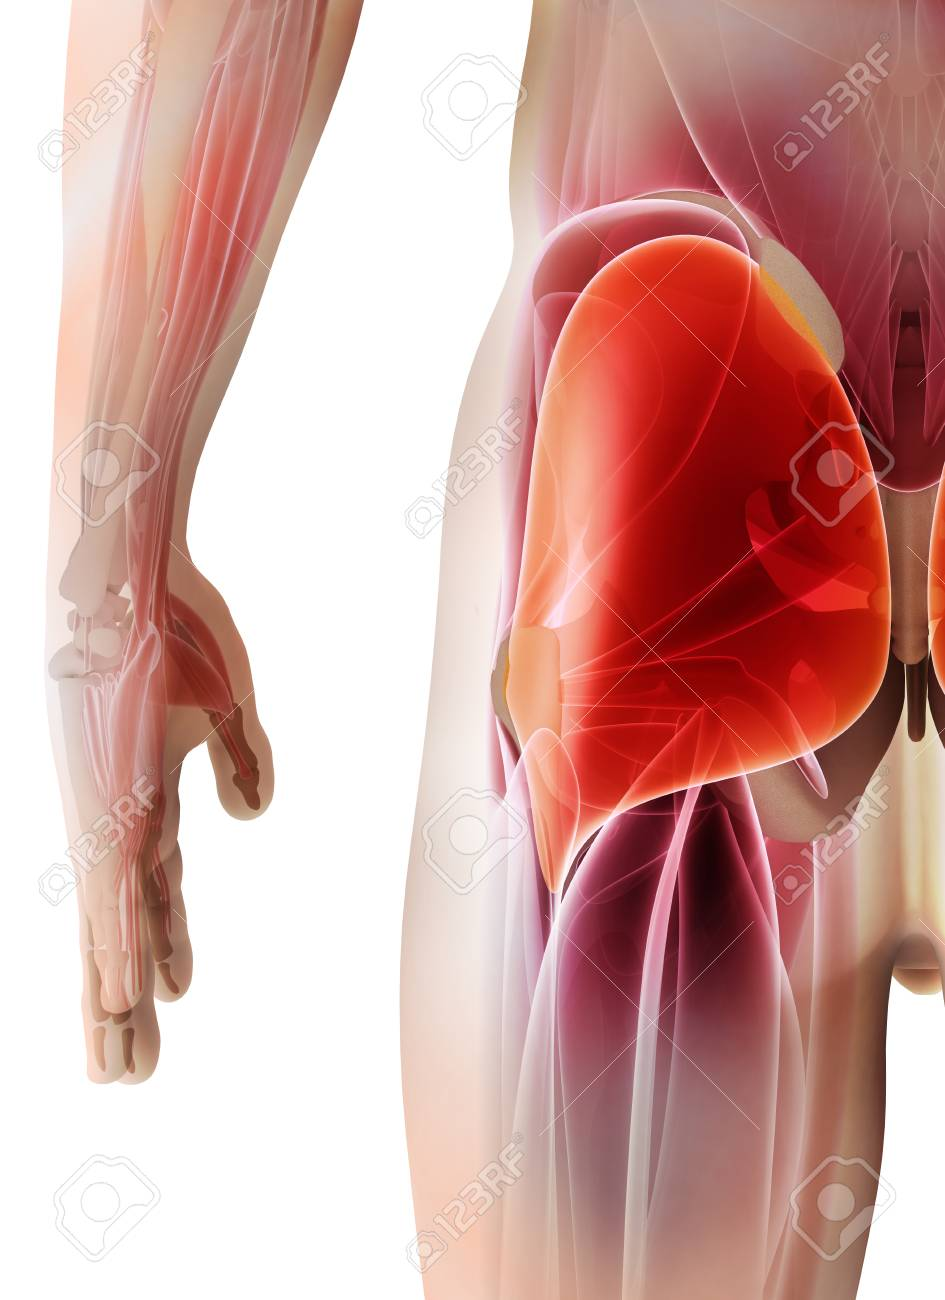 3d Illustration Of Gluteus Maximus Part Of Muscle Anatomy Stock